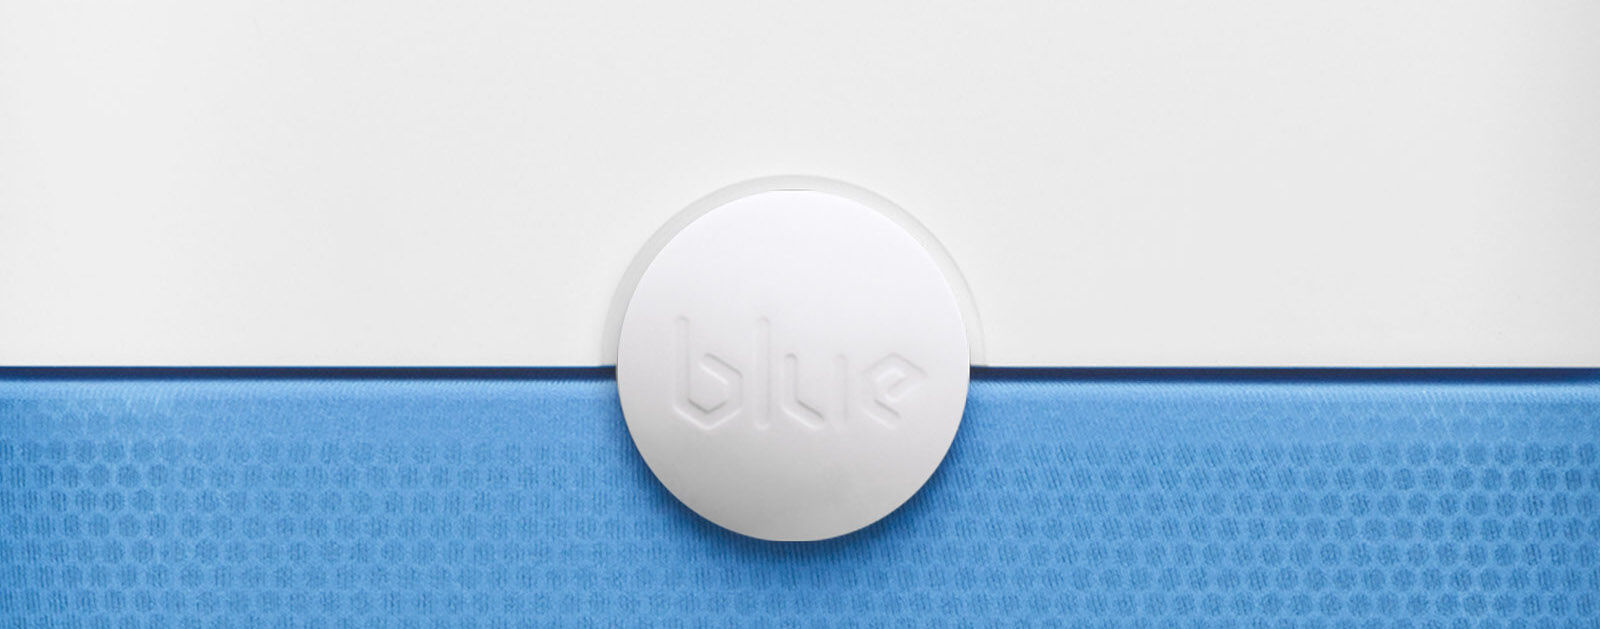 Blueair  Blue family  clp-blue-2-test